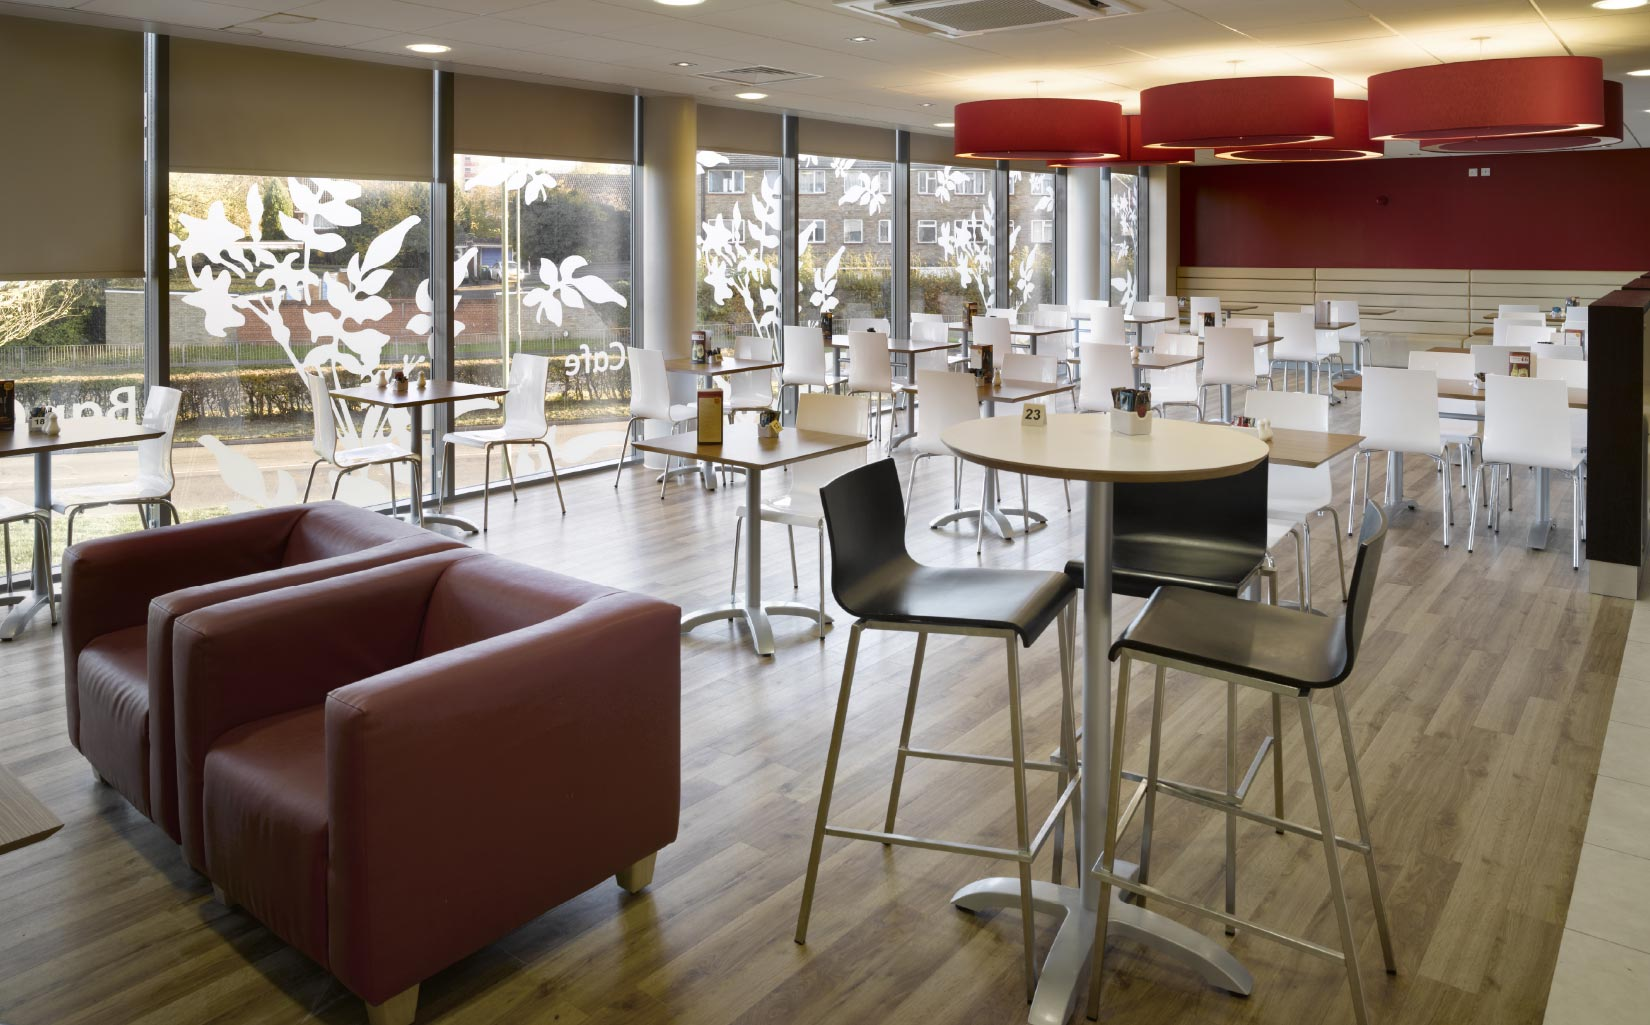 Travelodge, Hemel Hempstead, Cafe Interior